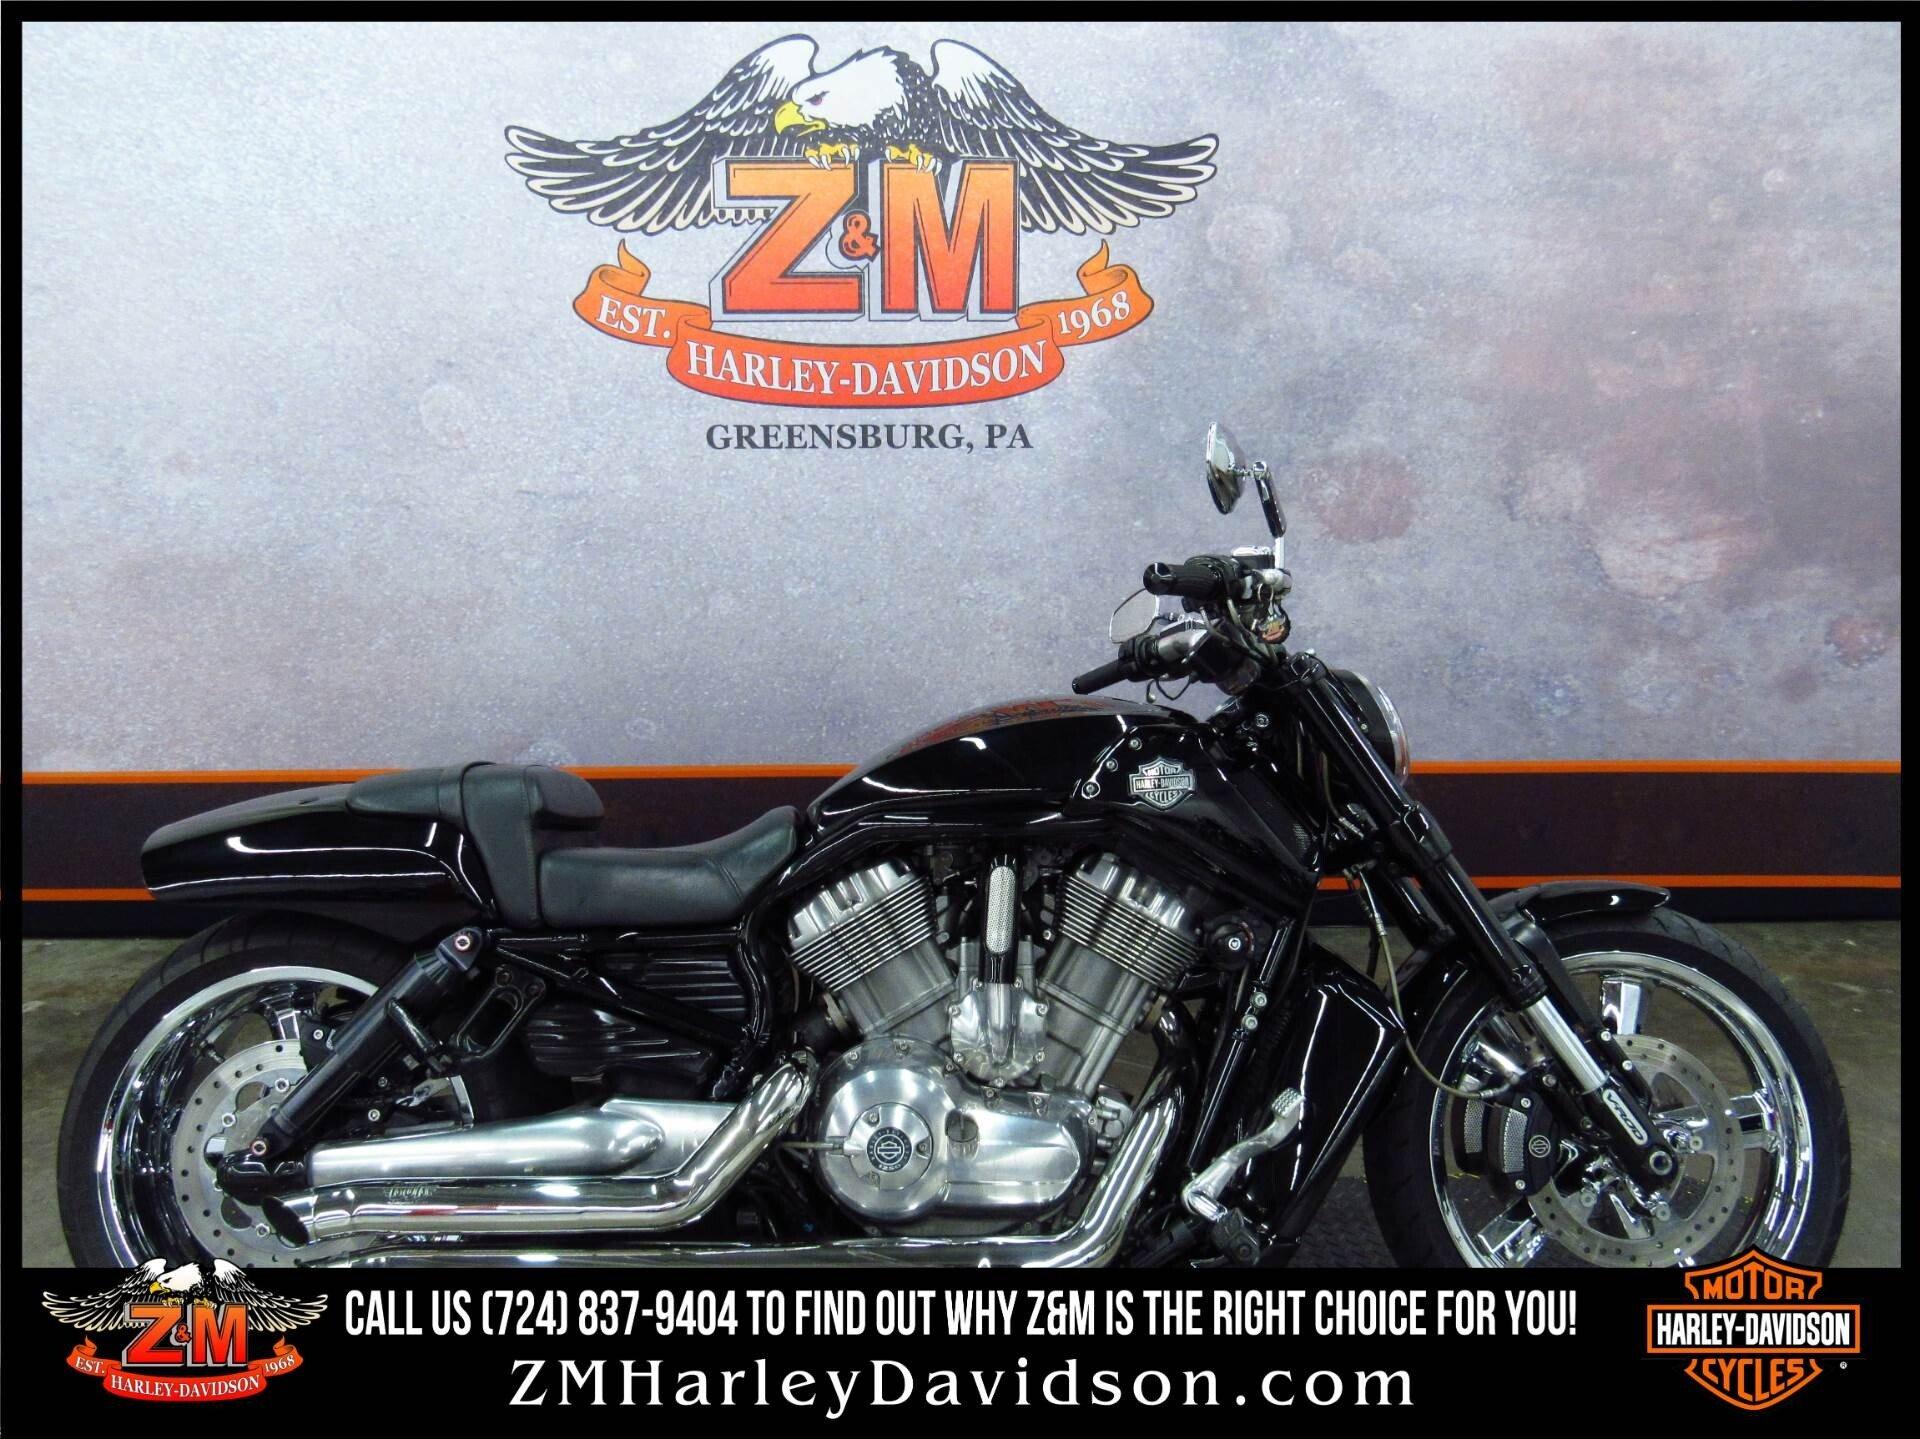 Harley Davidson V Rod Motorcycles For Sale Motorcycles On Autotrader